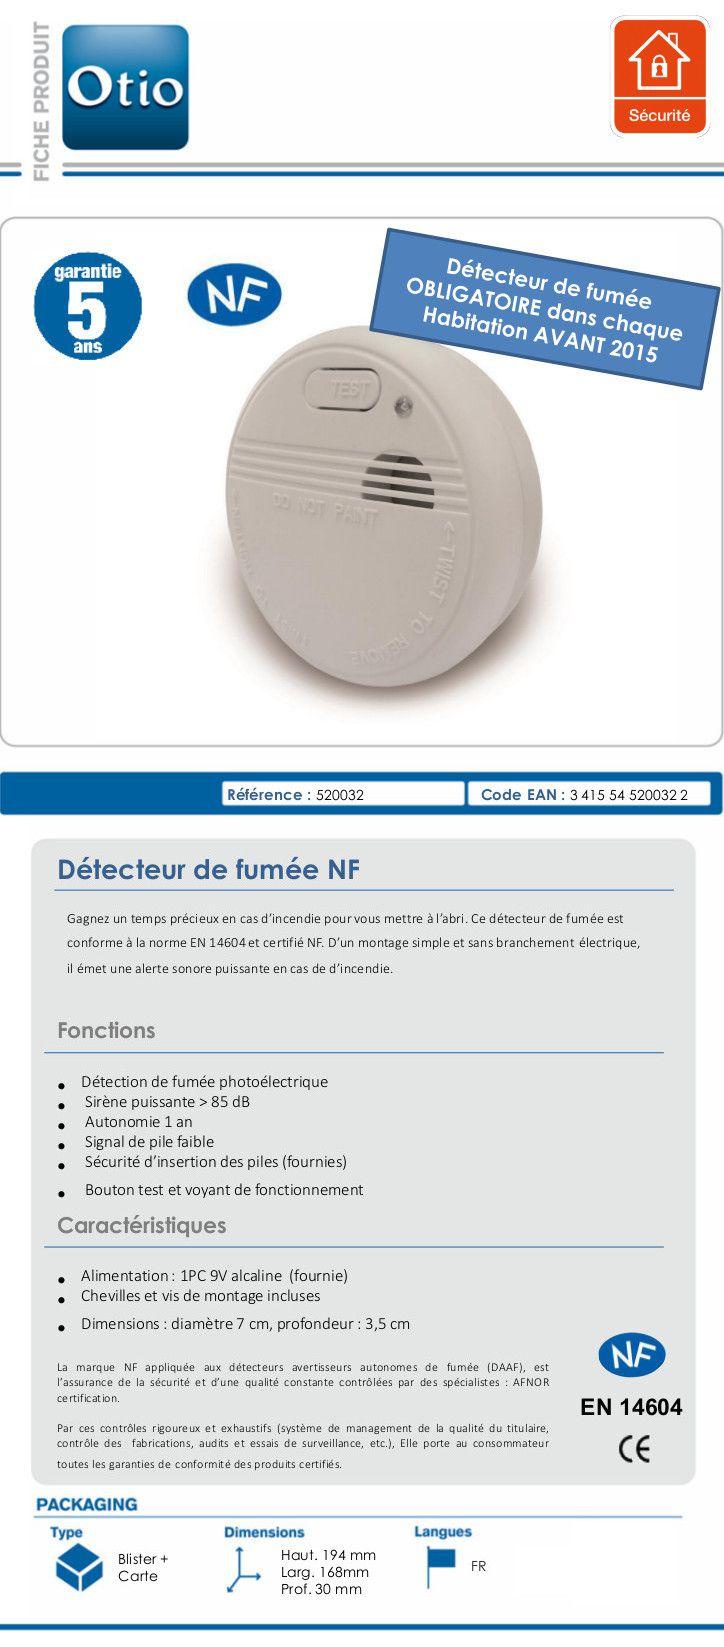 Detecteur de fumee otio pas cher for Castorama application